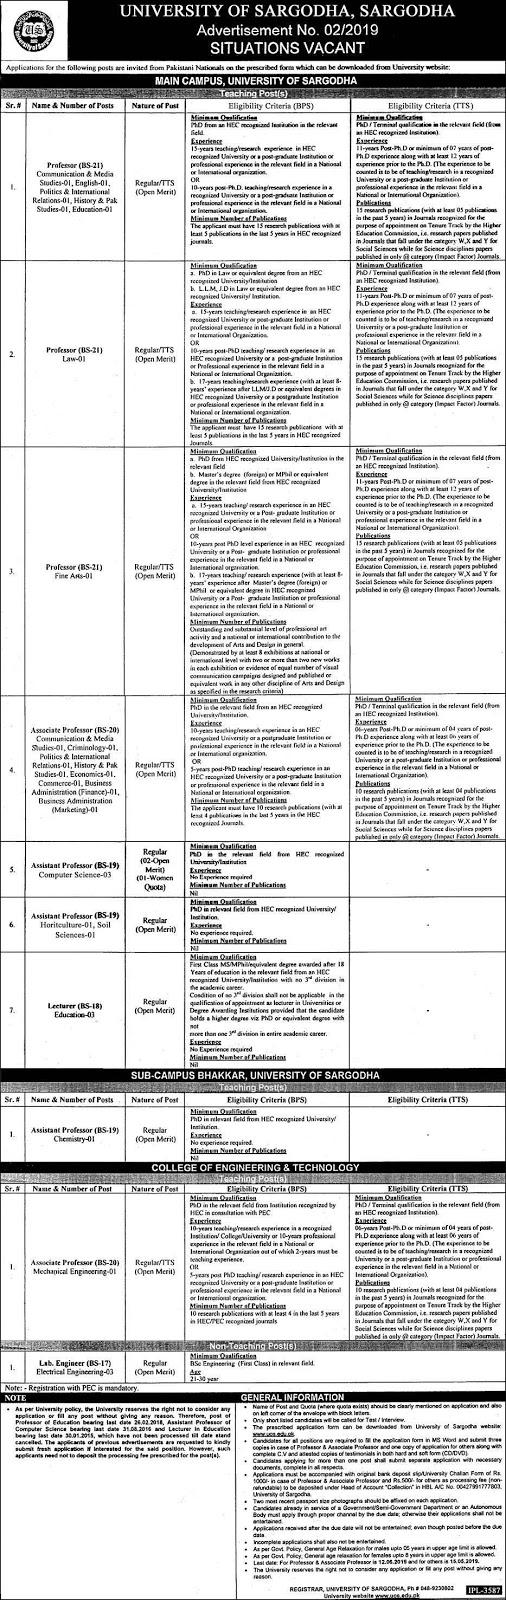 Jobs In University of Sargodha 19 Apr 2019